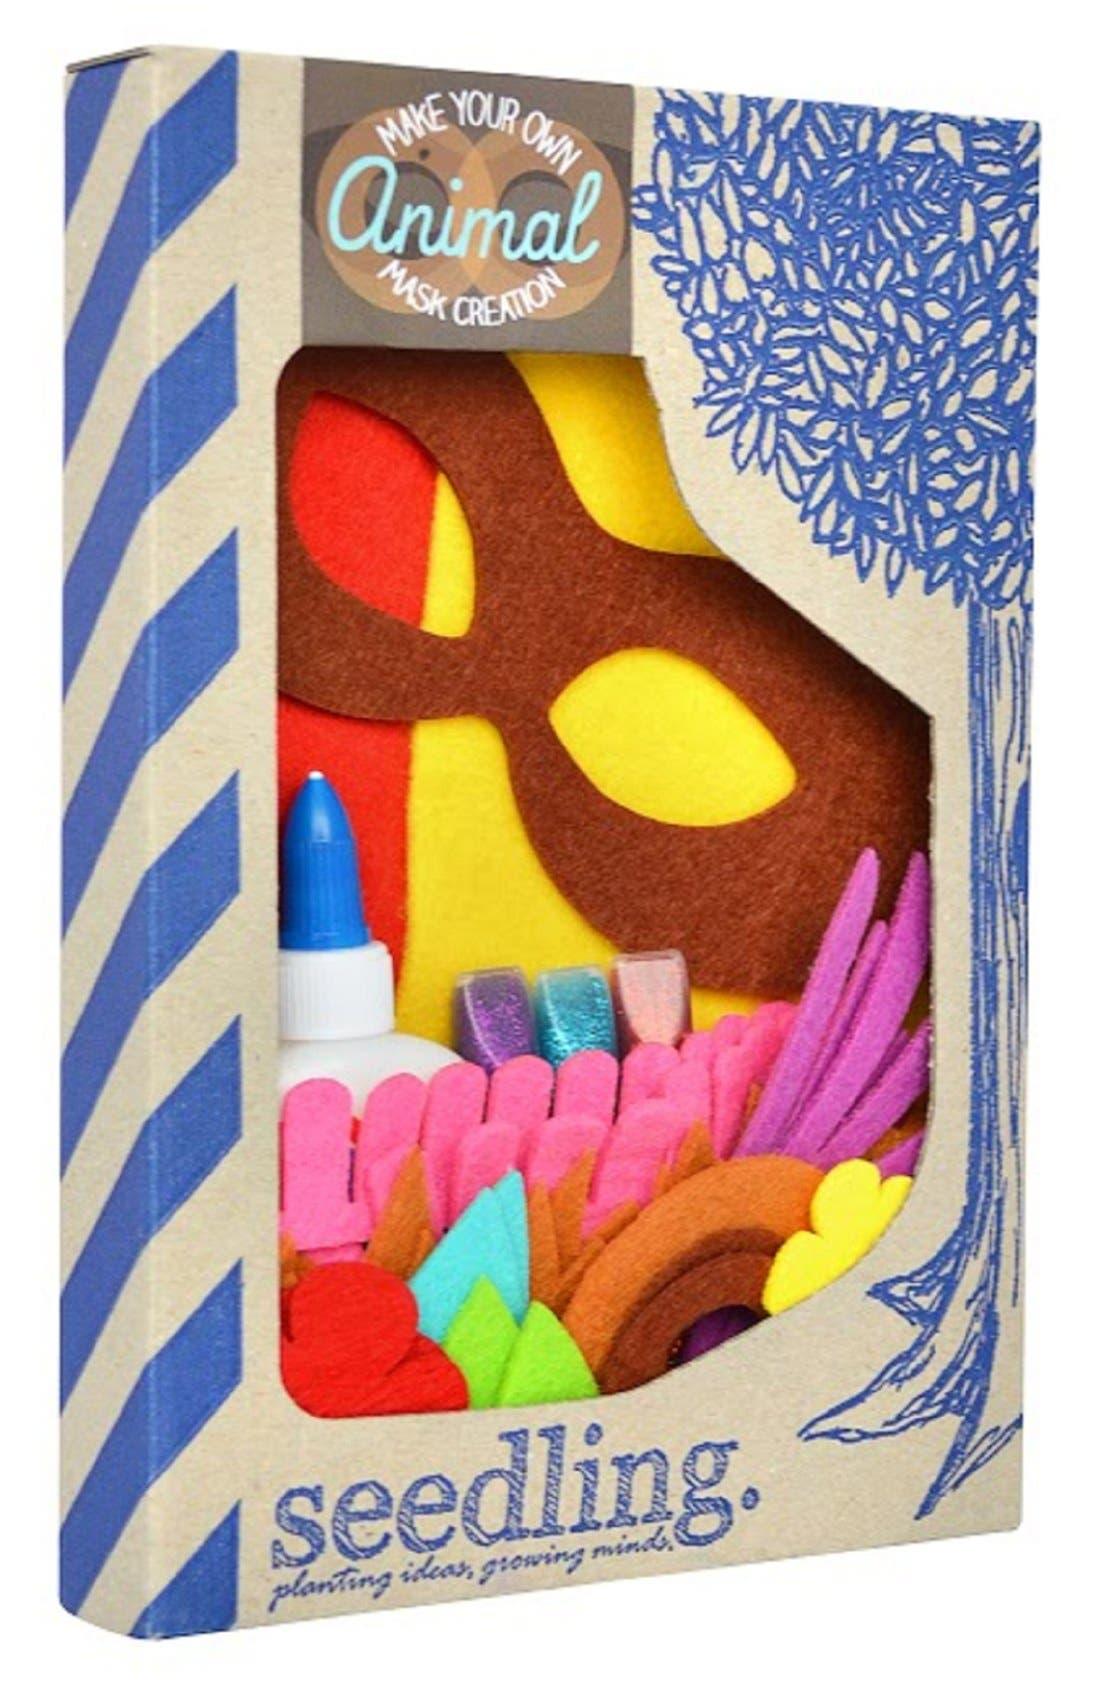 Alternate Image 1 Selected - seedling 'Make Your Own Animal Mask Creation' DIY Craft Kit